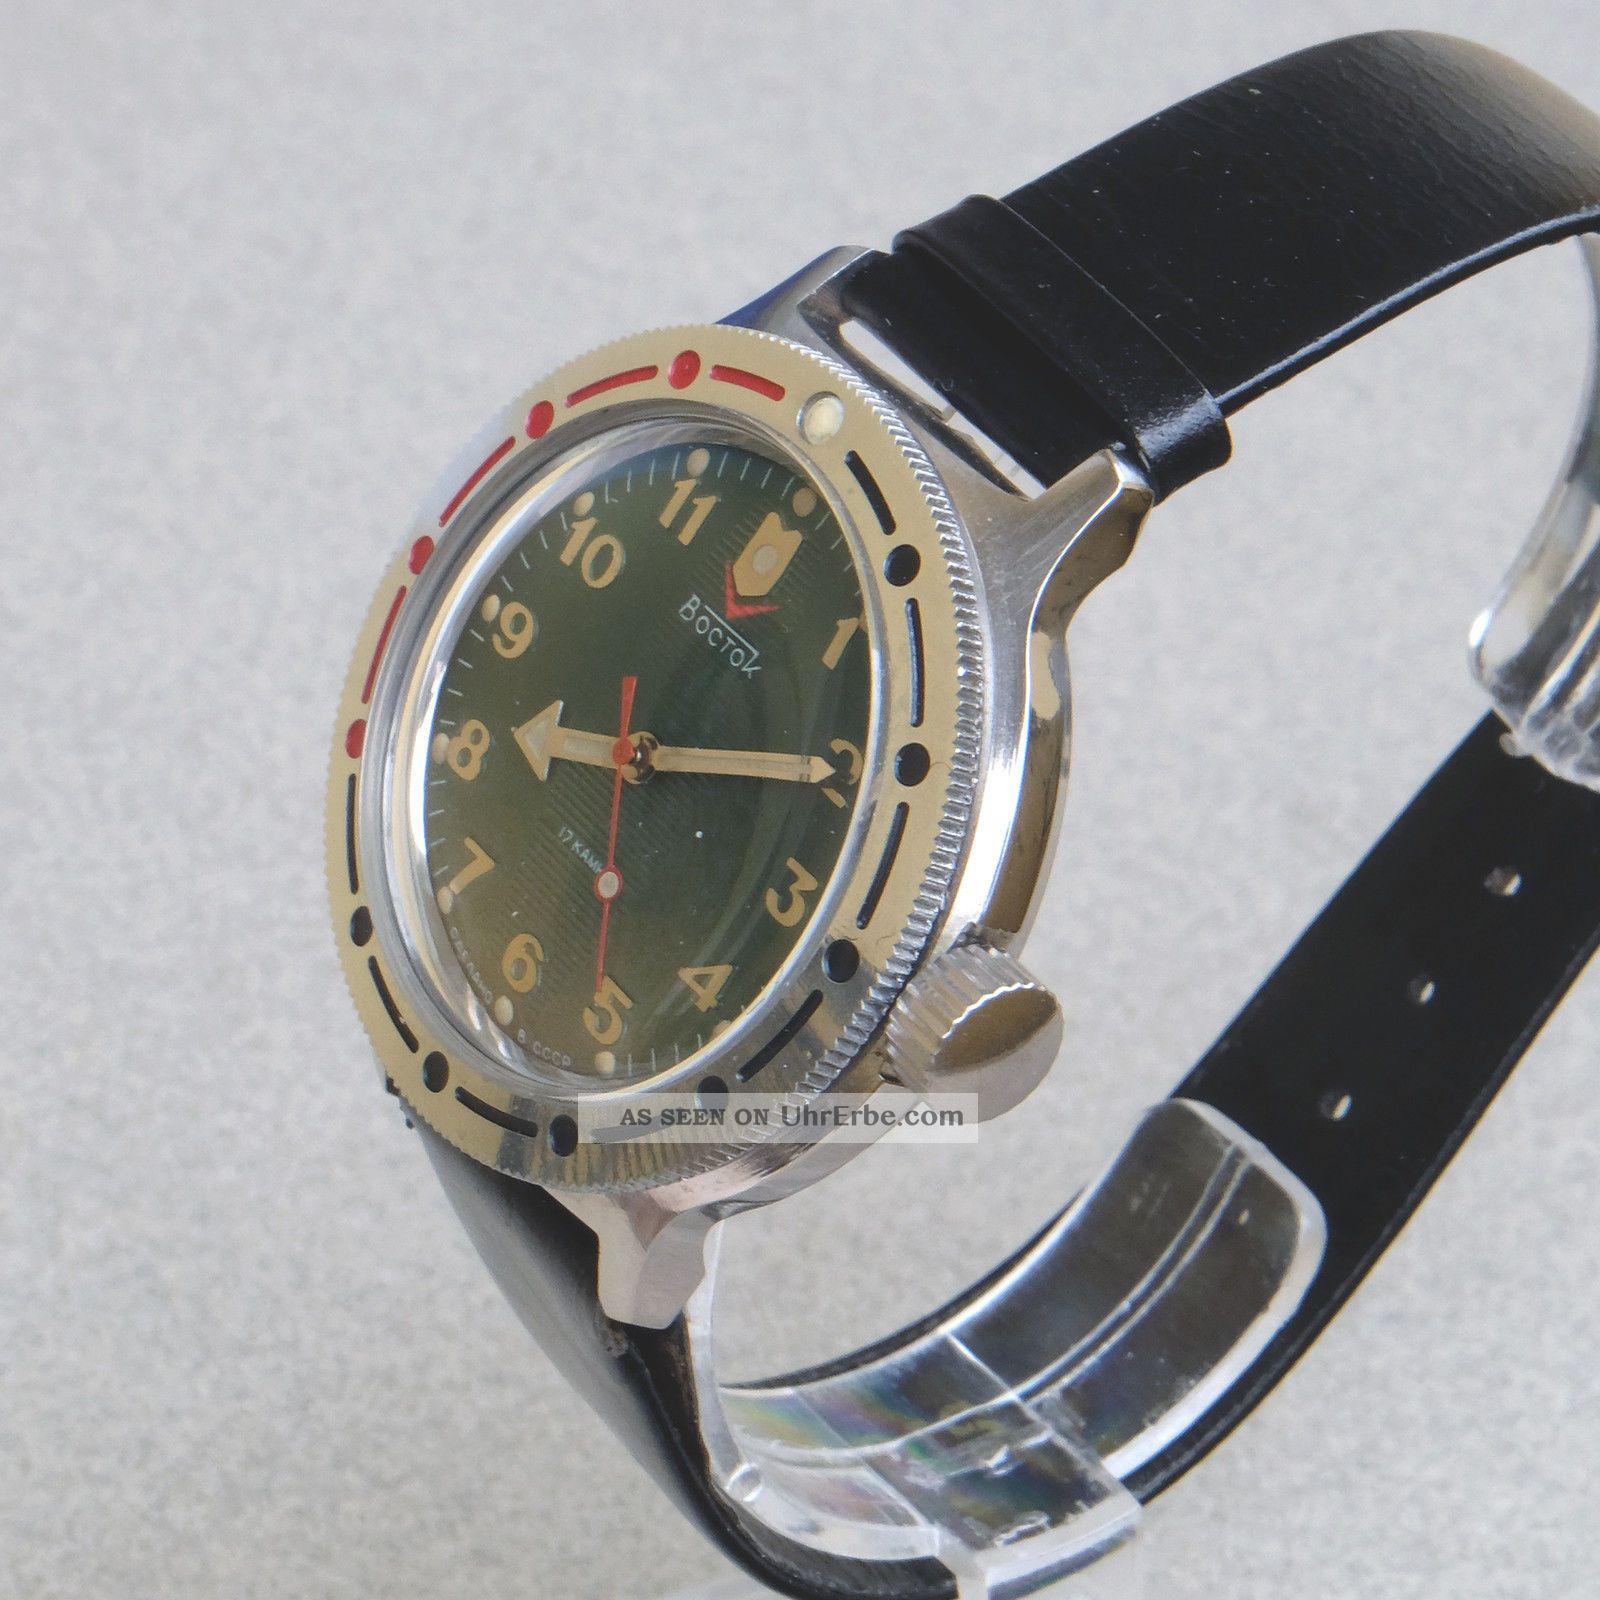 Boctok 17jewels Vostok Herren Militr Uhr Russian Mens Watch Handaufzug Arrow